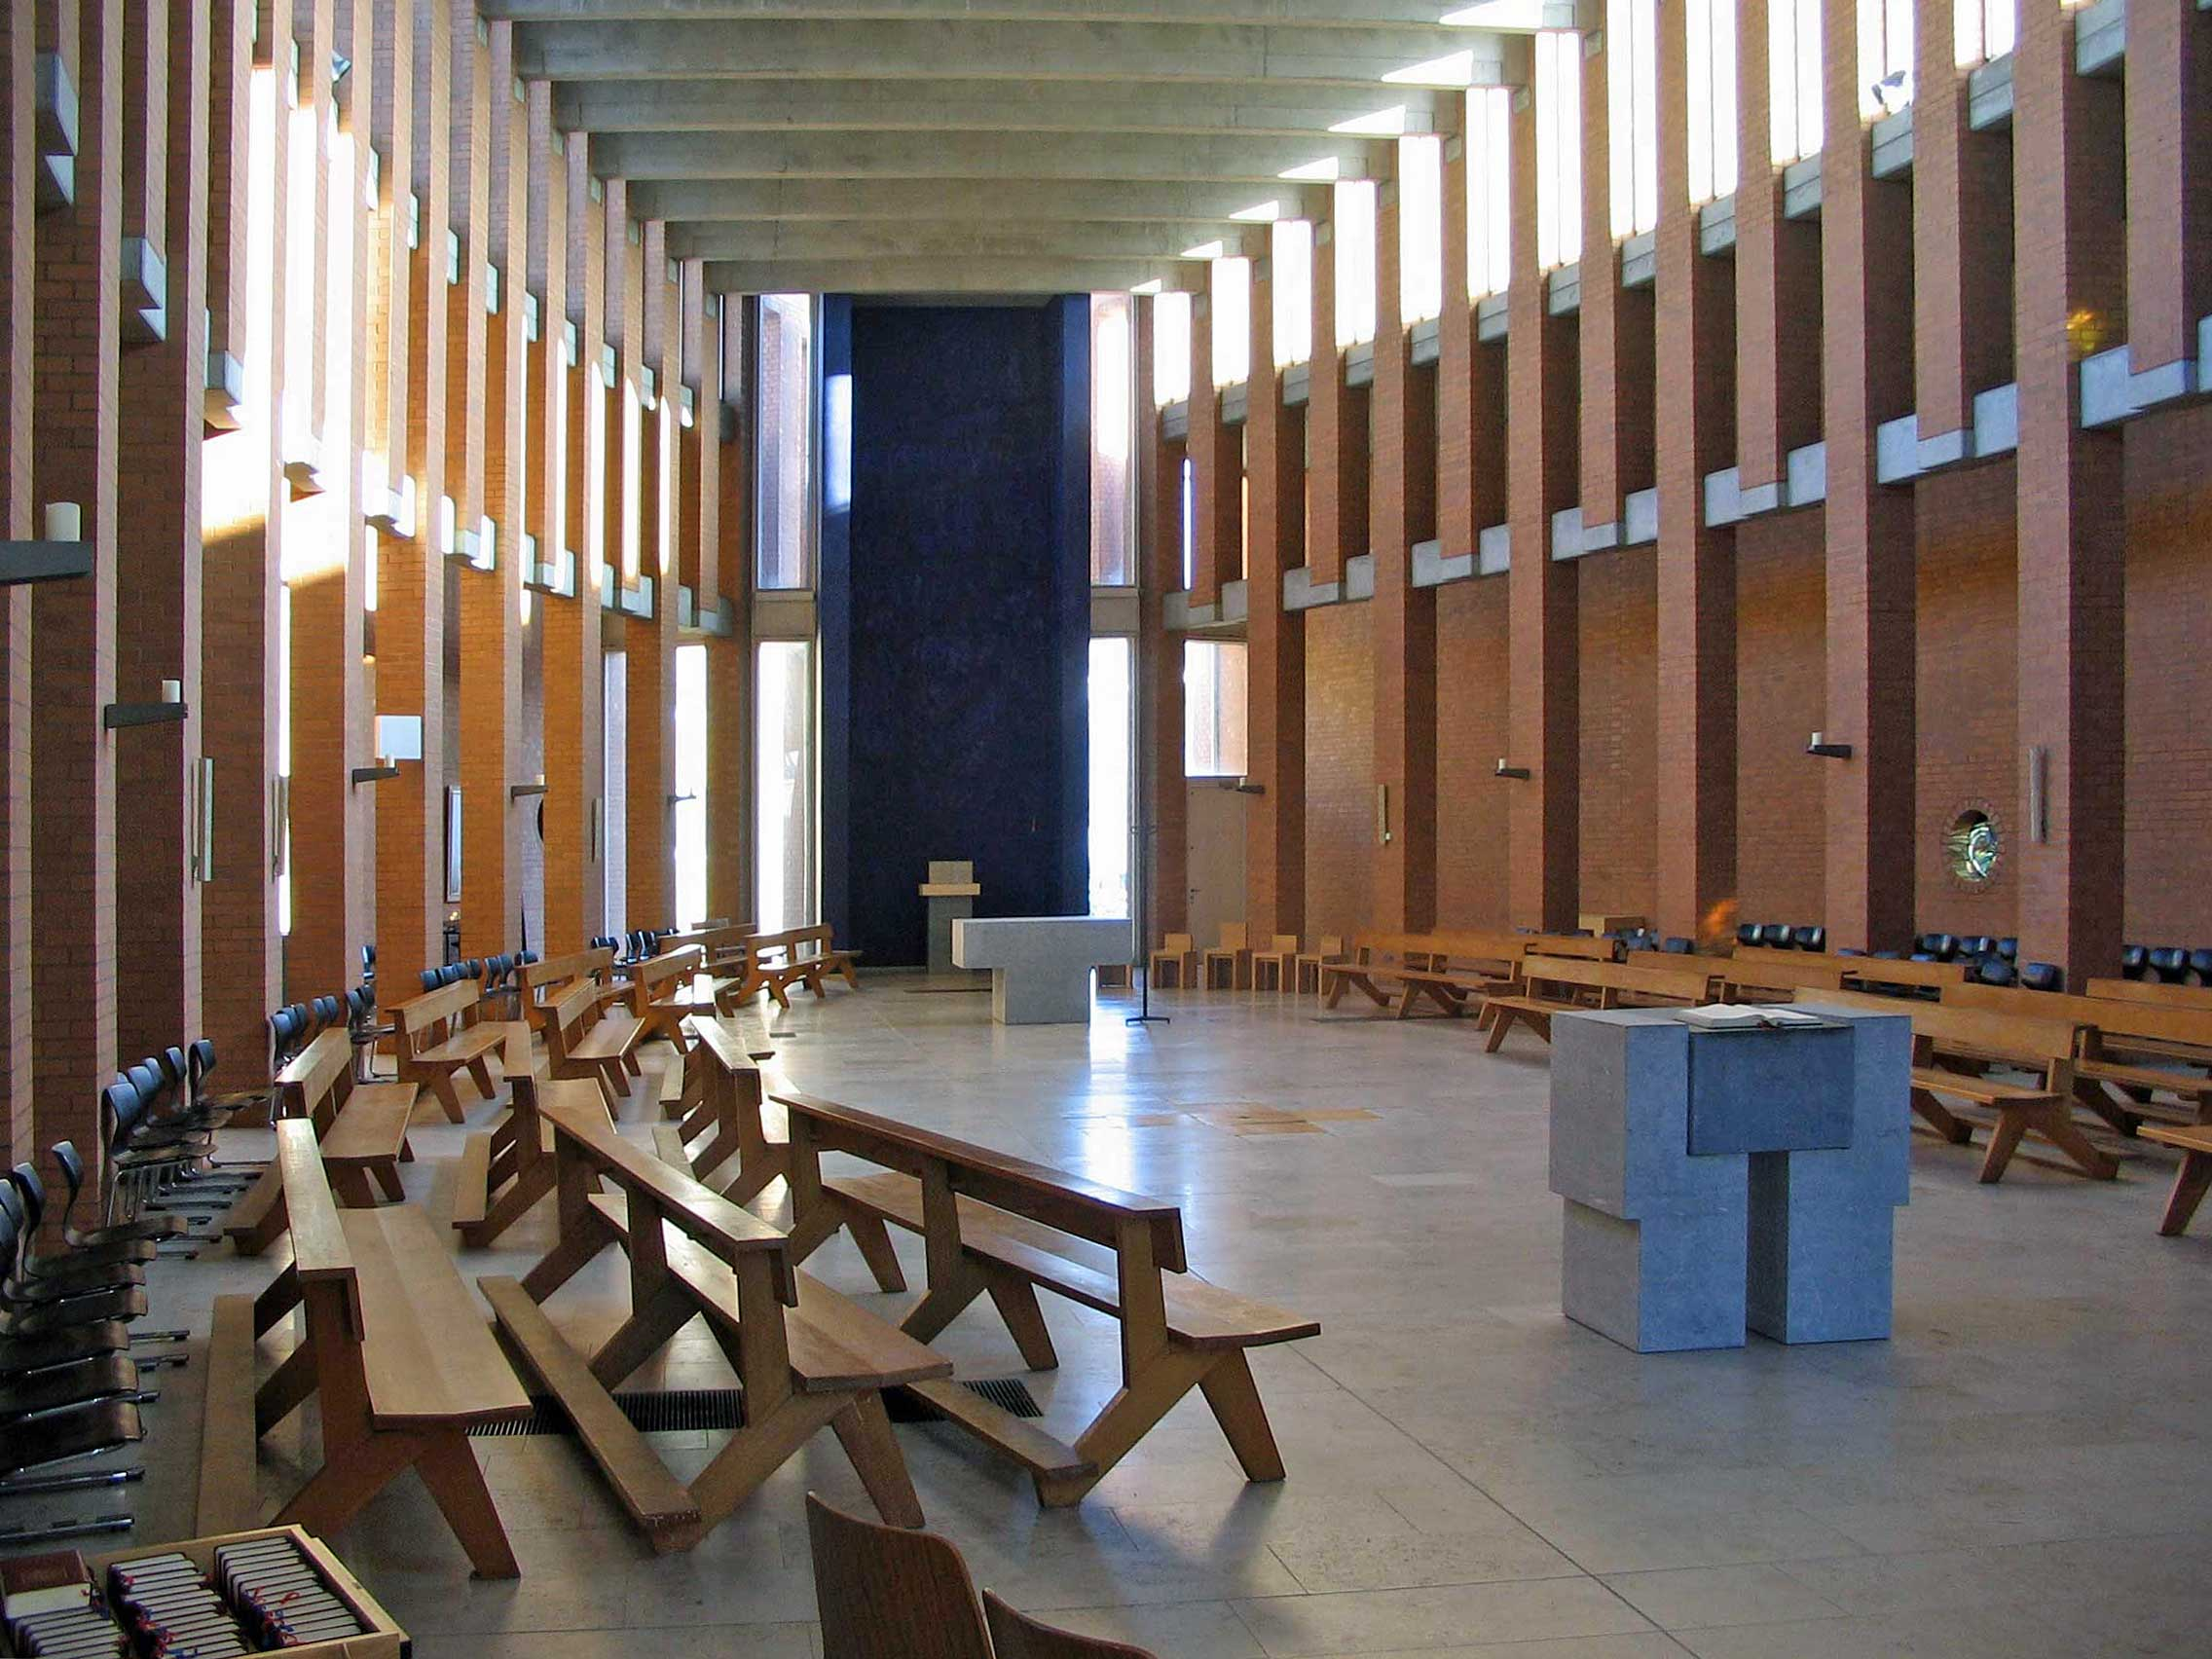 Westerland/Sylt | St. Christophorus | Innenraum | Foto: Brühl, PD